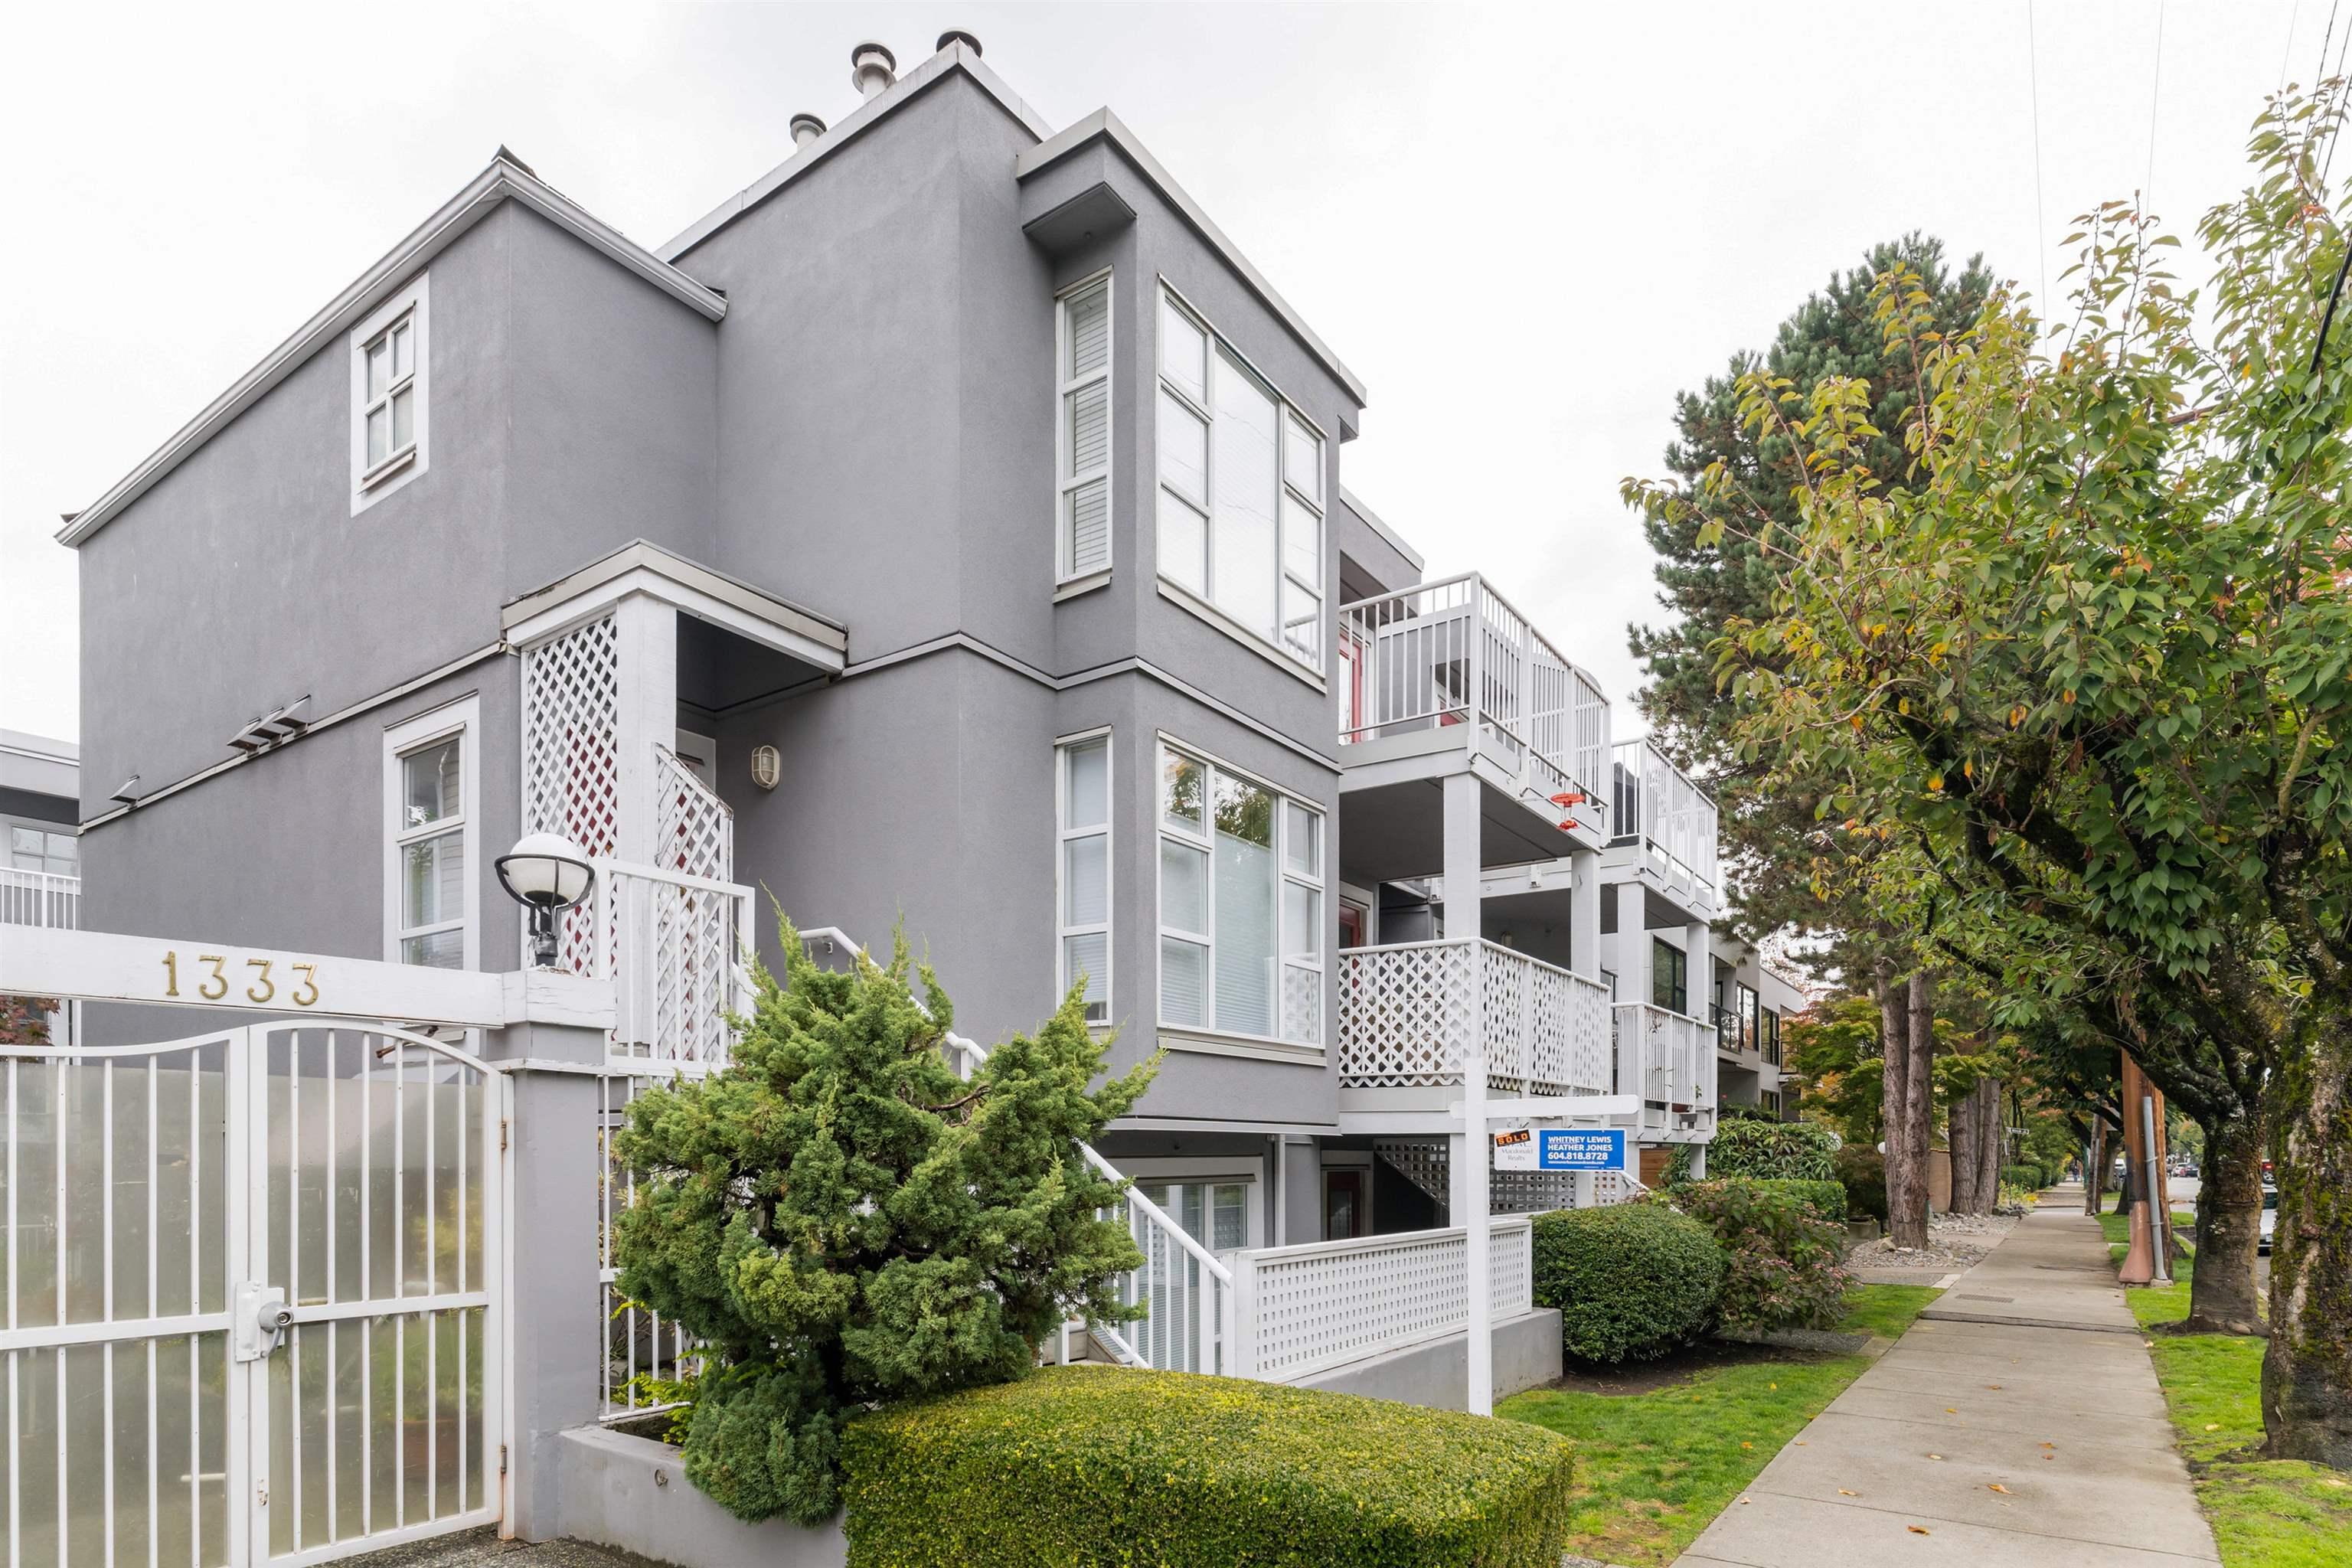 304 1333 W 7TH AVENUE - Fairview VW Apartment/Condo for sale, 1 Bedroom (R2626728)